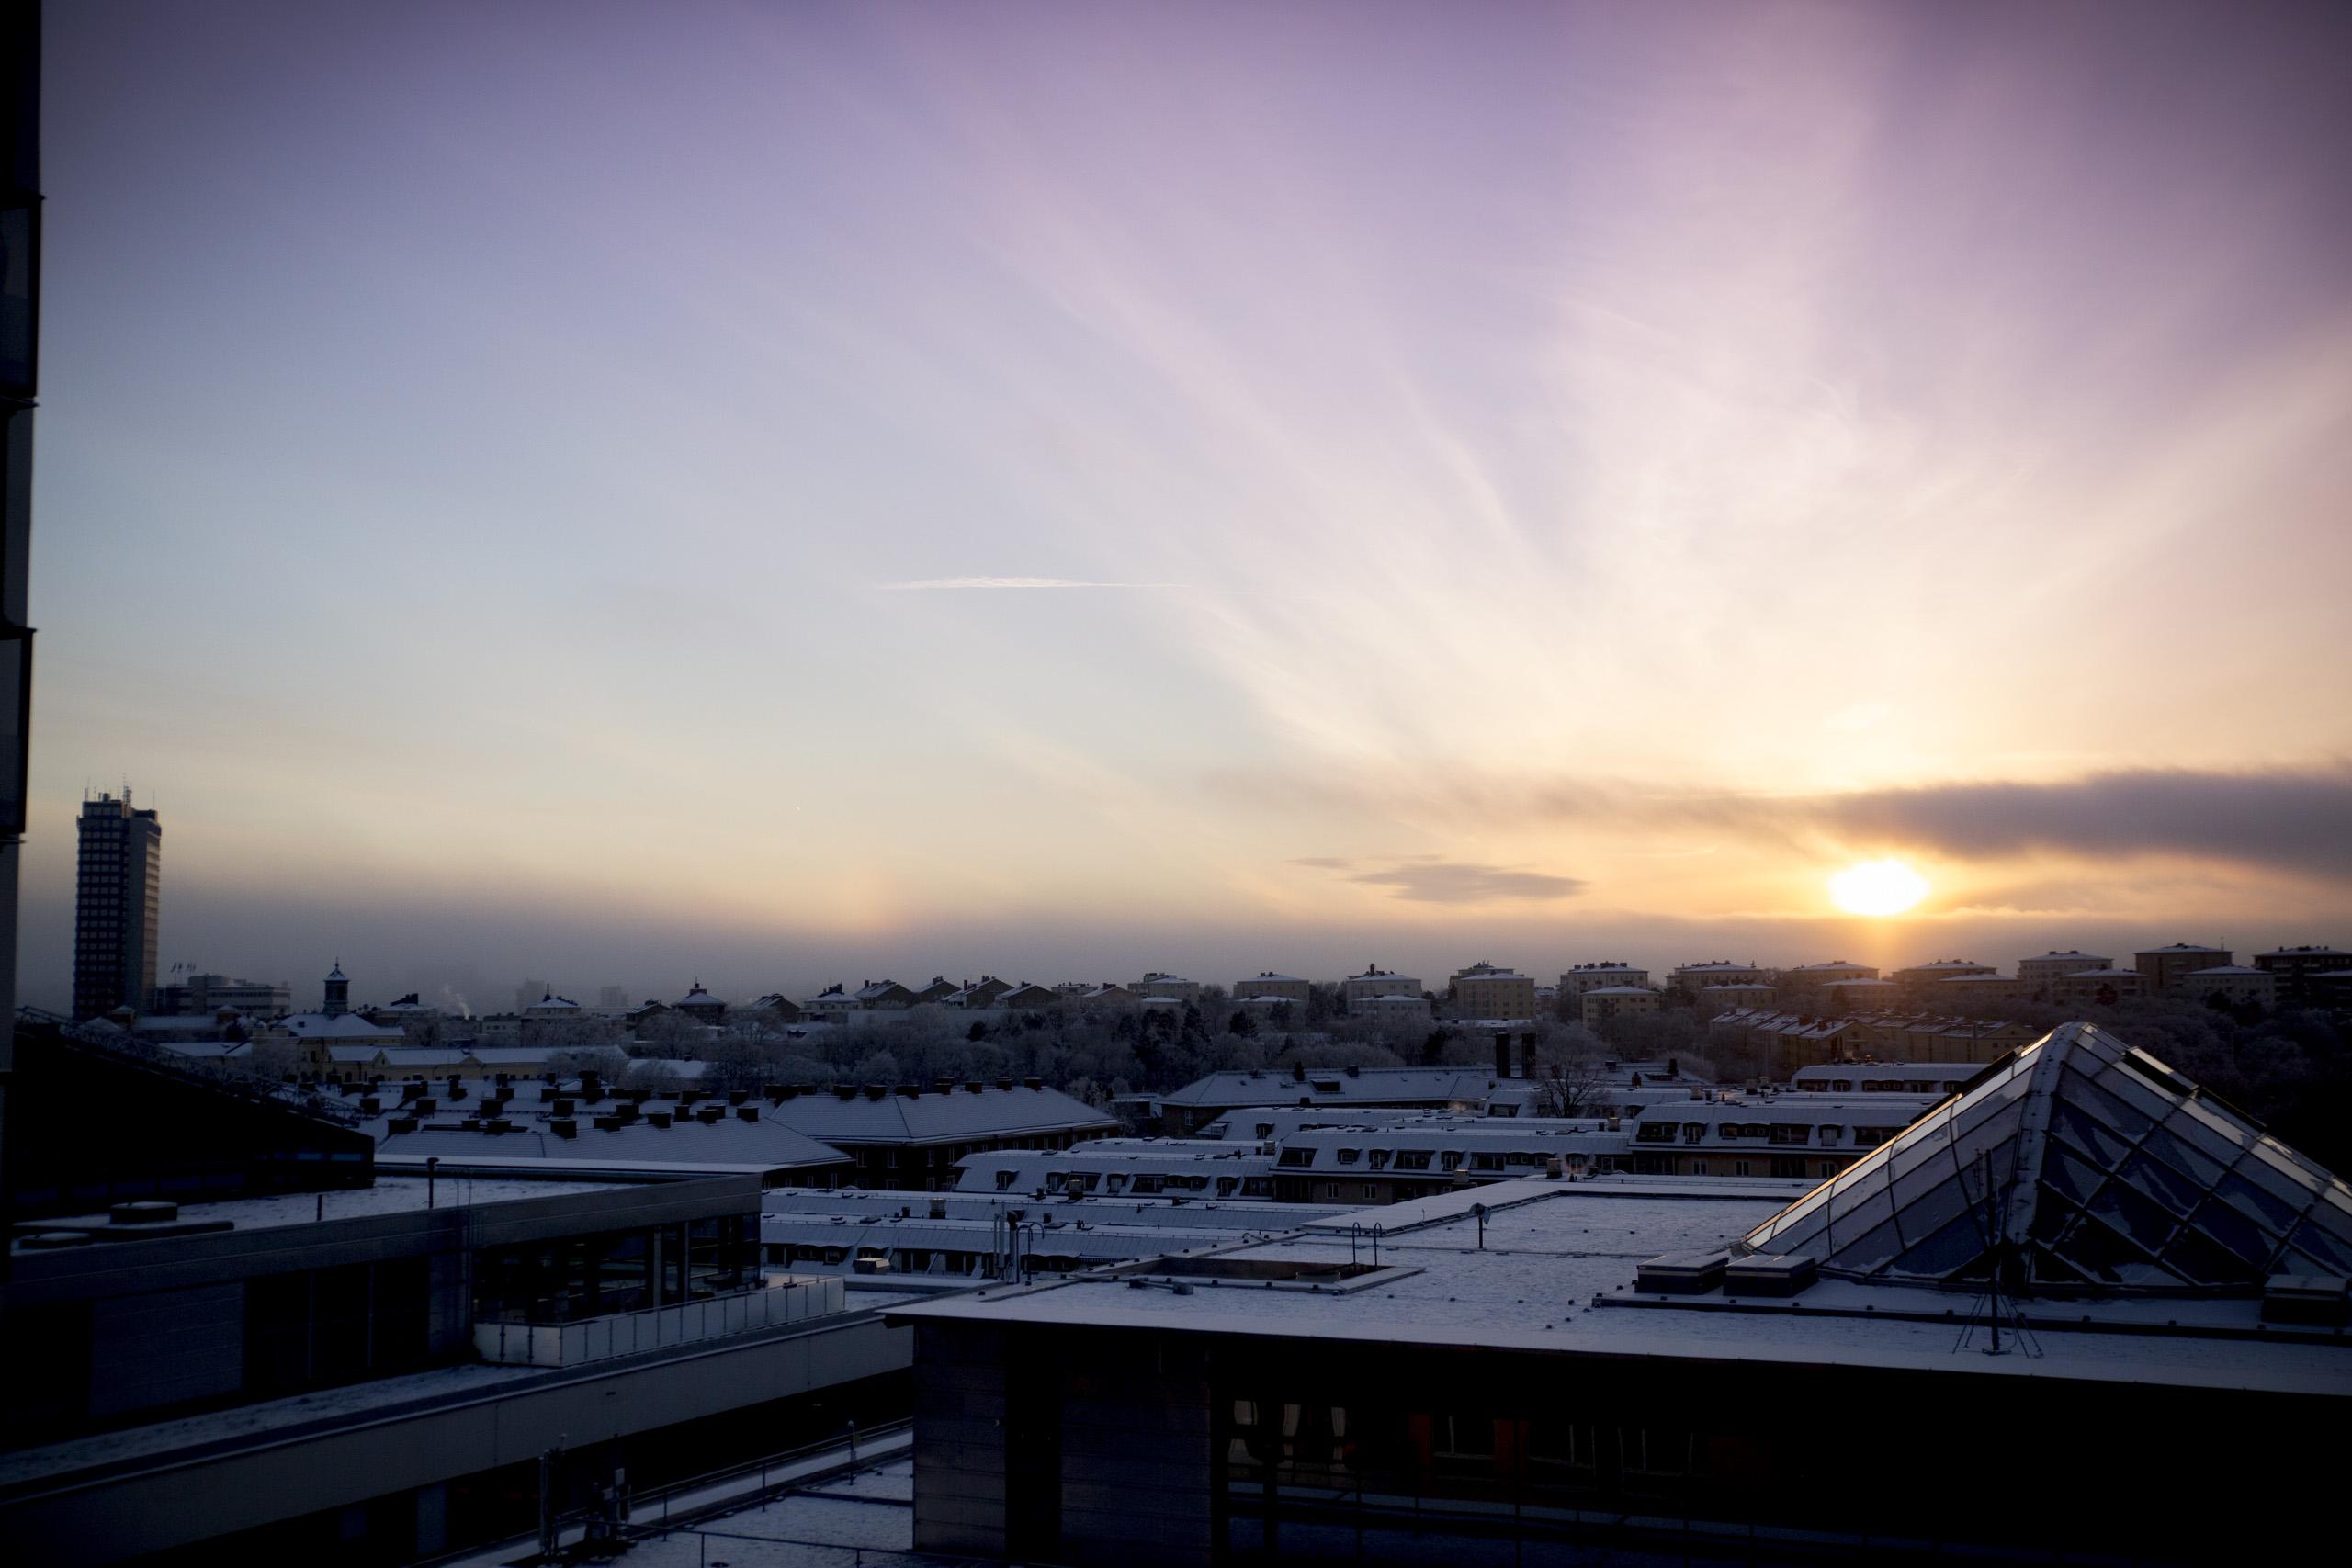 Sunset_lindhagen